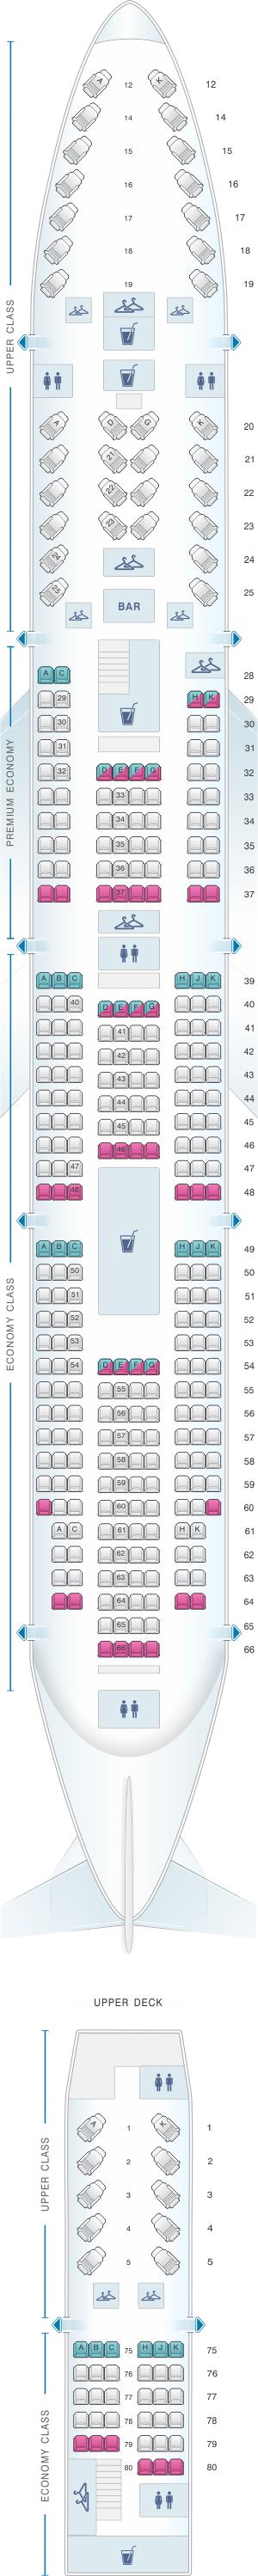 Seat map for Virgin Atlantic Boeing B747 400 LH